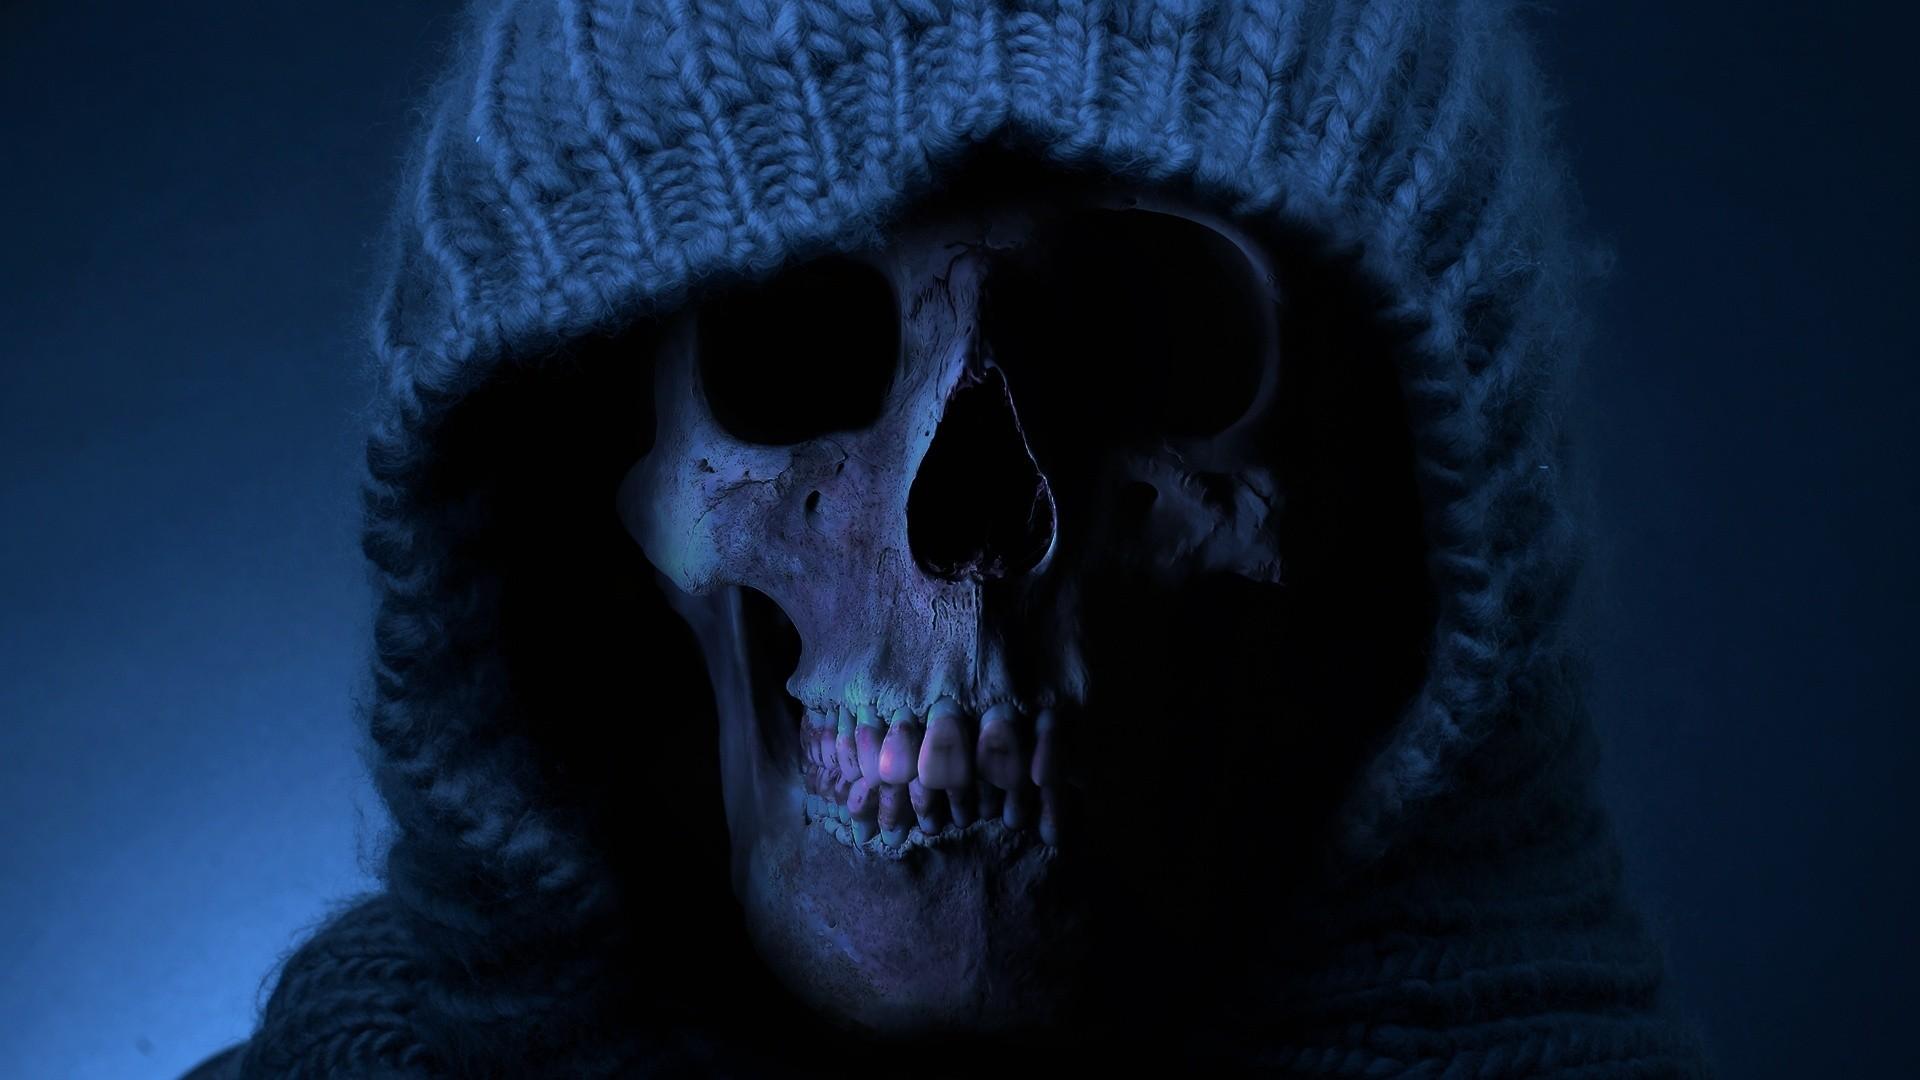 Skull Hd Wallpapers 1920x1080